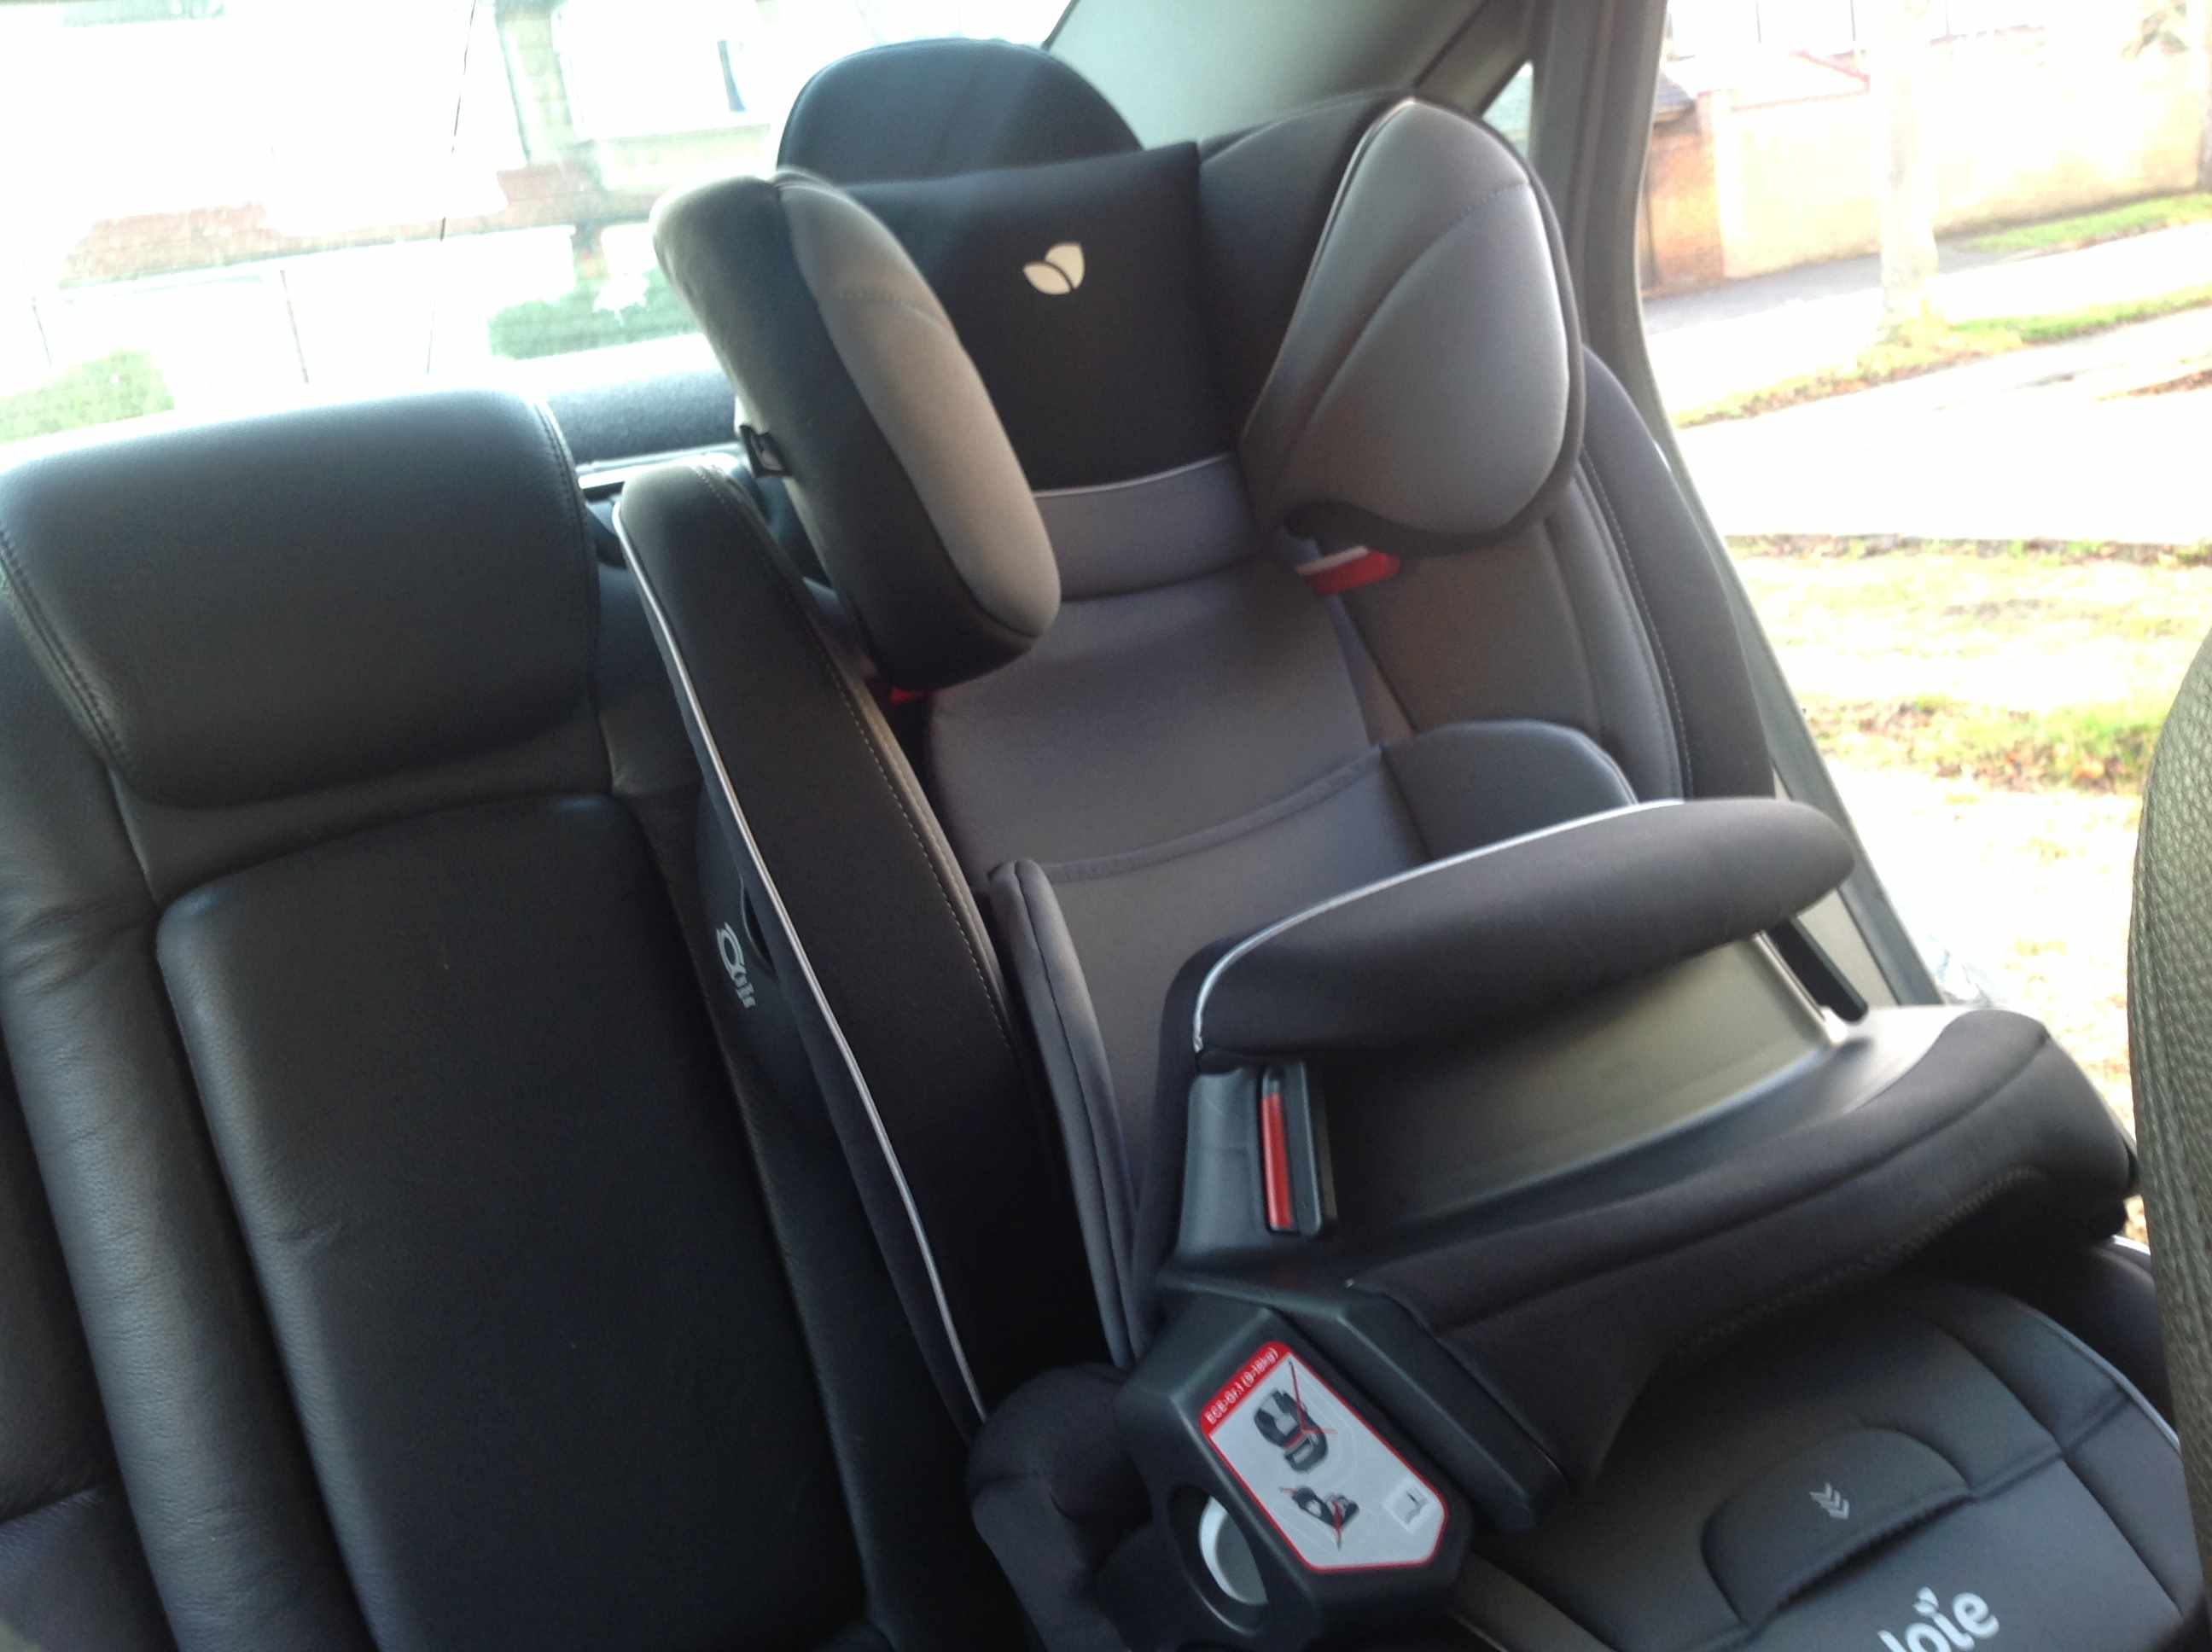 joie-transcend-group-1-2-3-car-seat_169372